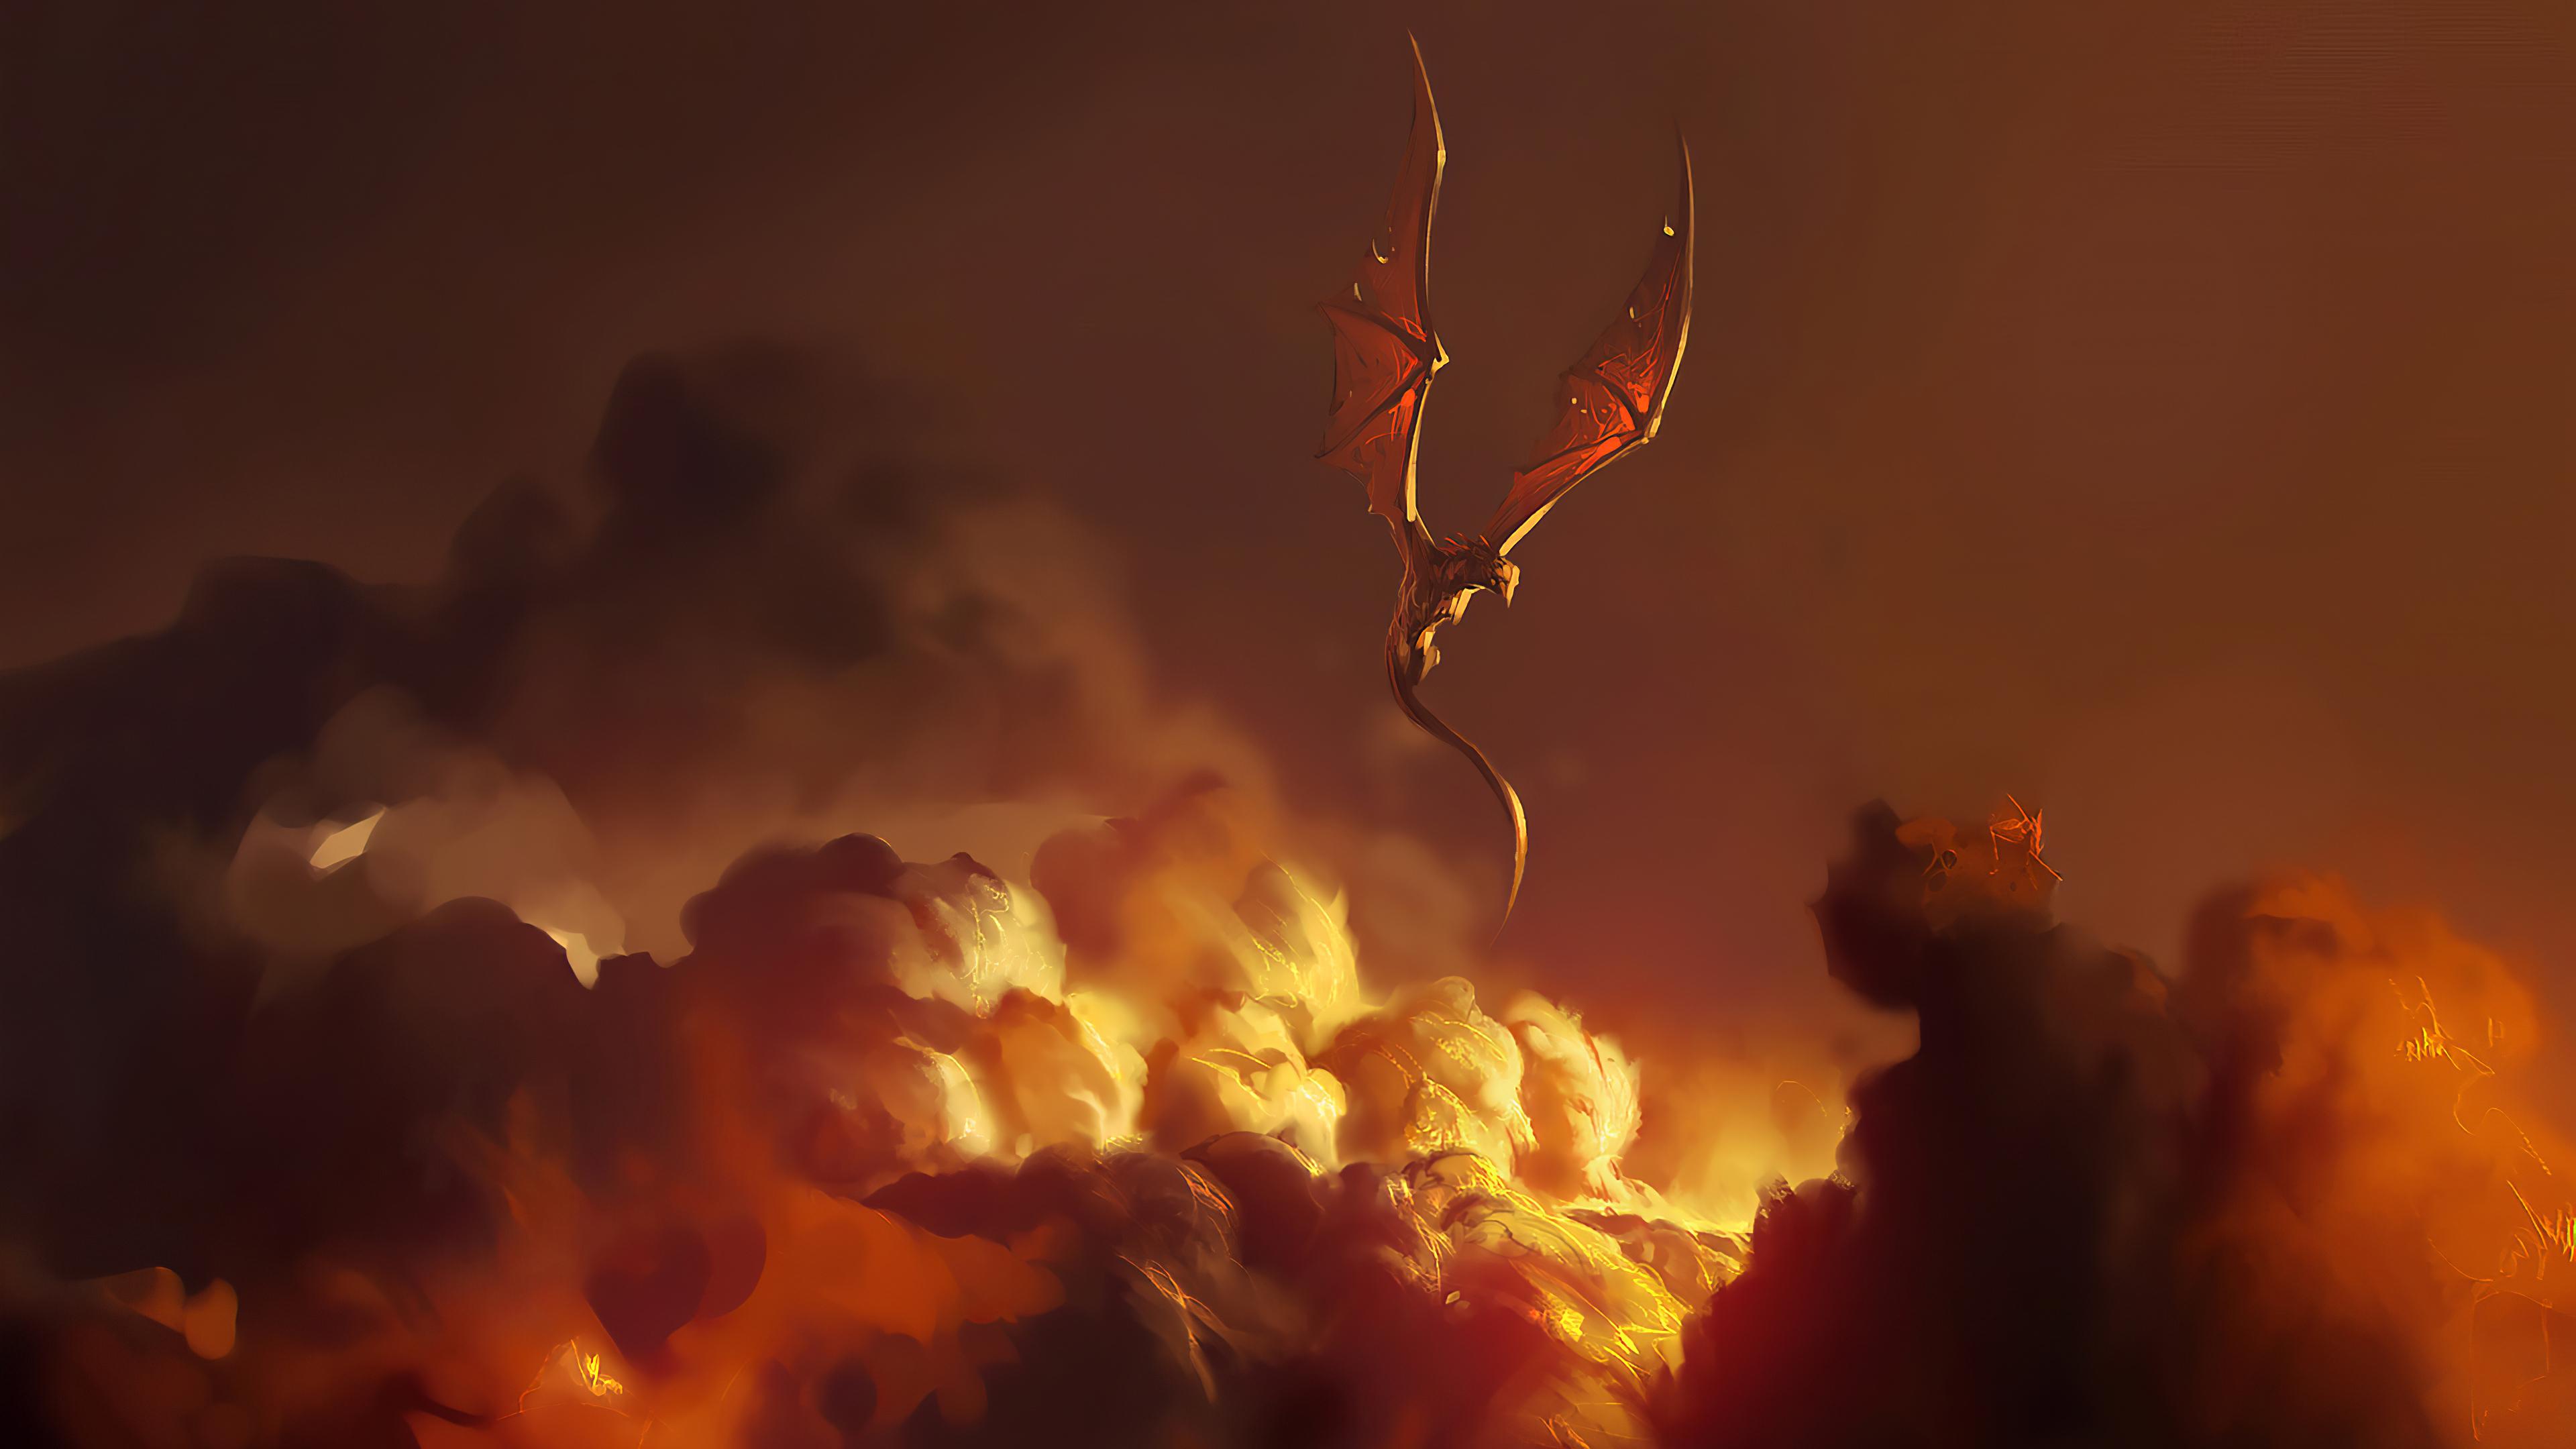 dragon clouds fire storm 1575662969 - Dragon Clouds Fire Storm -